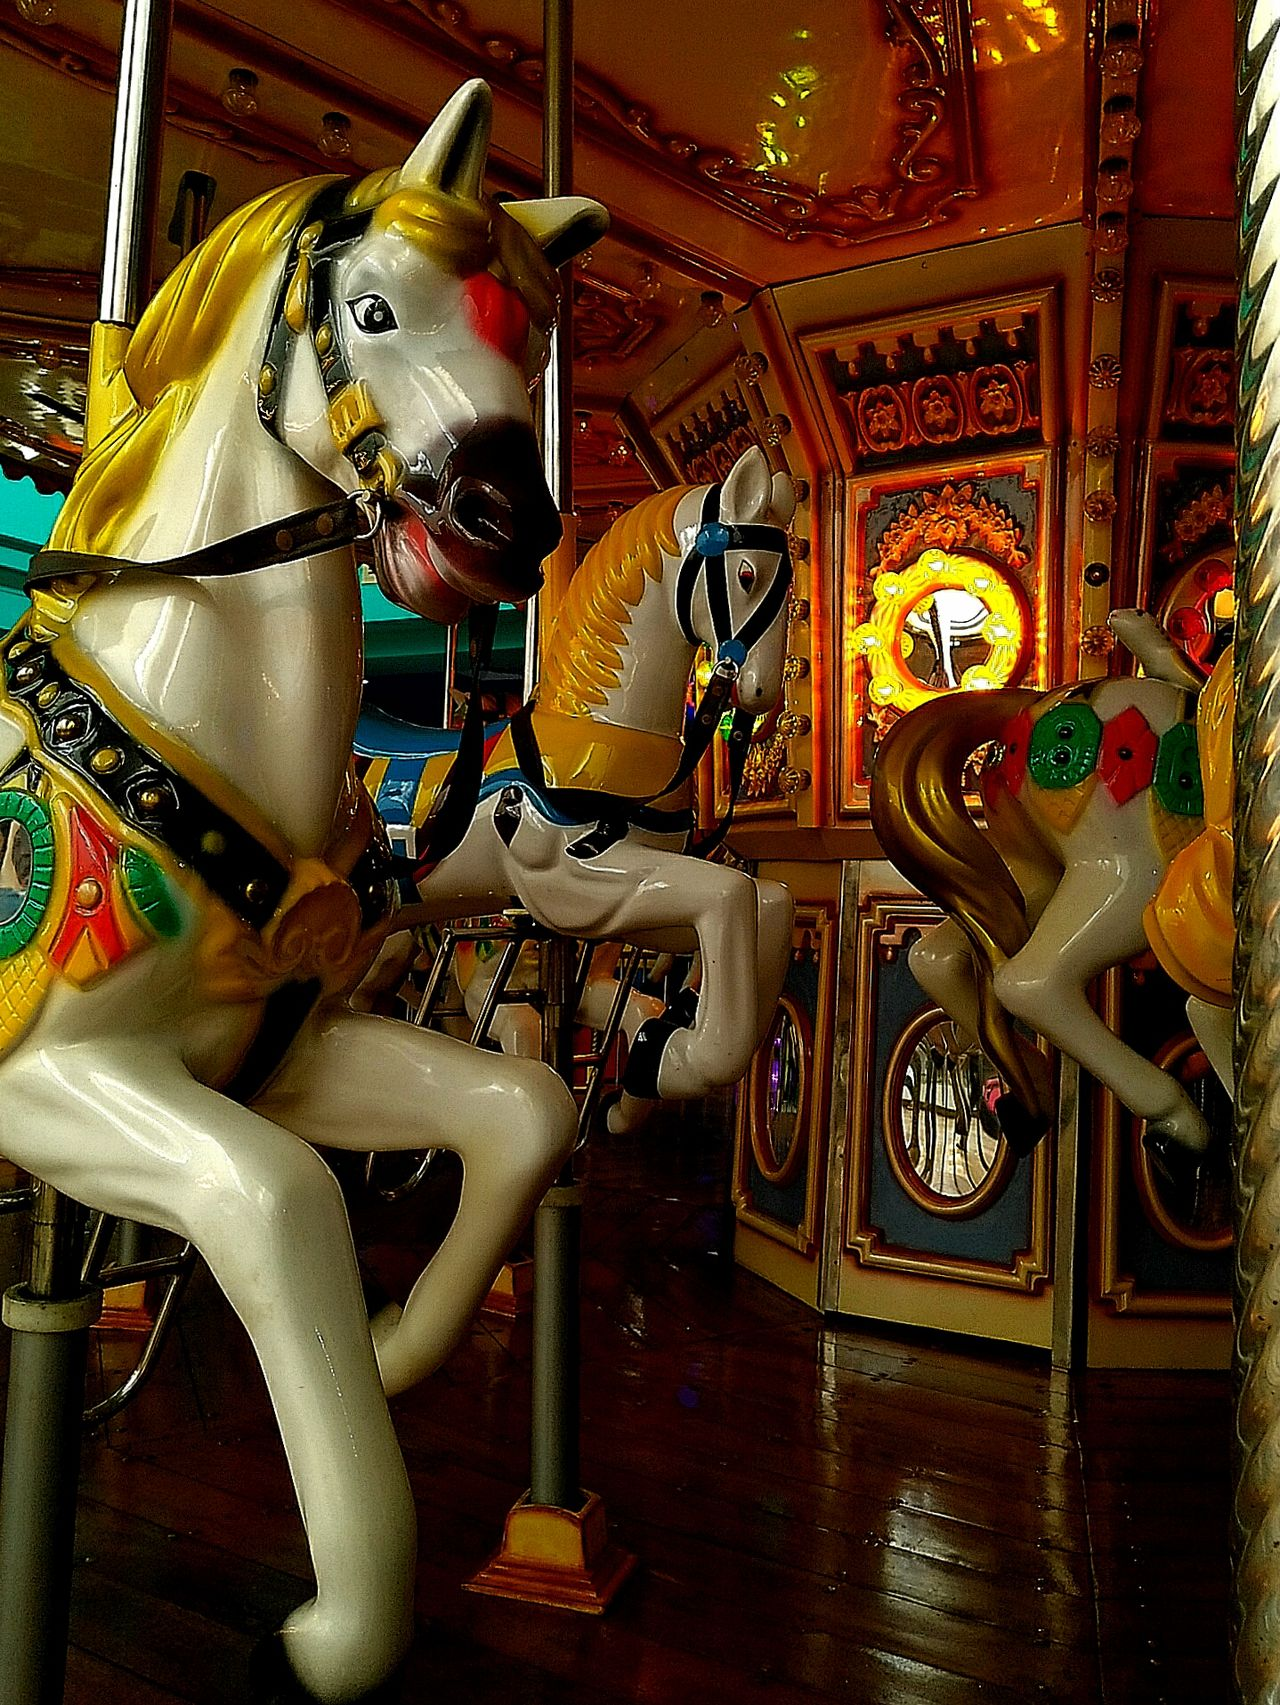 Merry Go Round Merrygoround Merrygoround Horse Playground Equipment Exibition Hall Merry Go Round Horse Horse Riding Carousel Ride Carousel Horses Carousel Lights Carousel Details